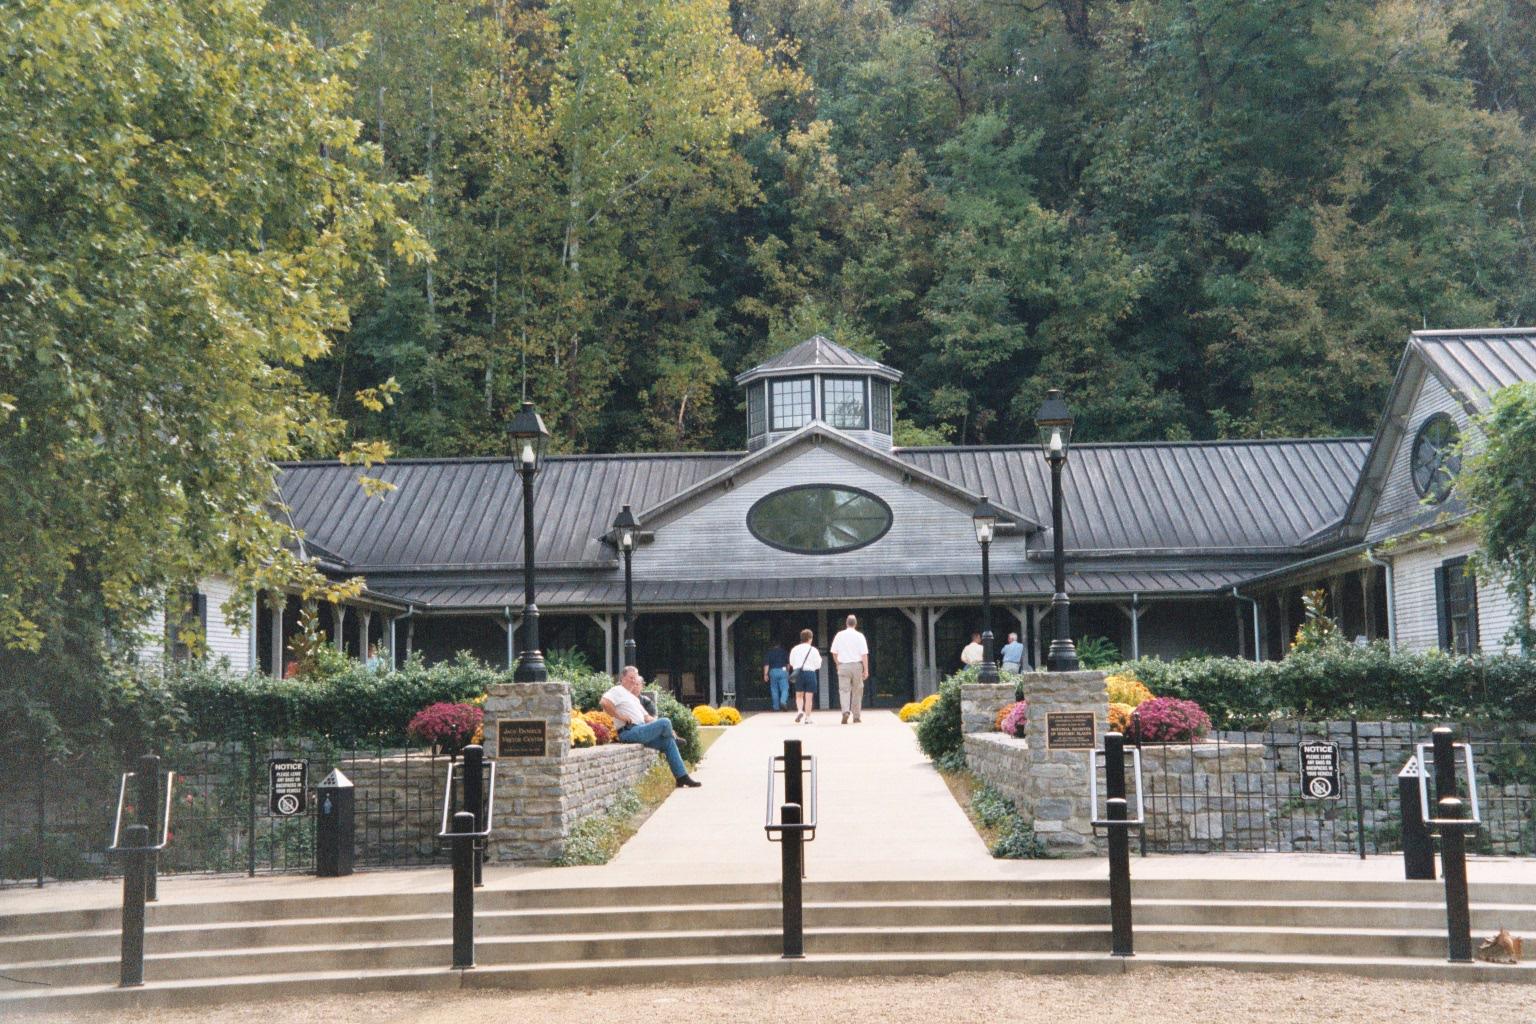 The Jack Daniels Visitors Center